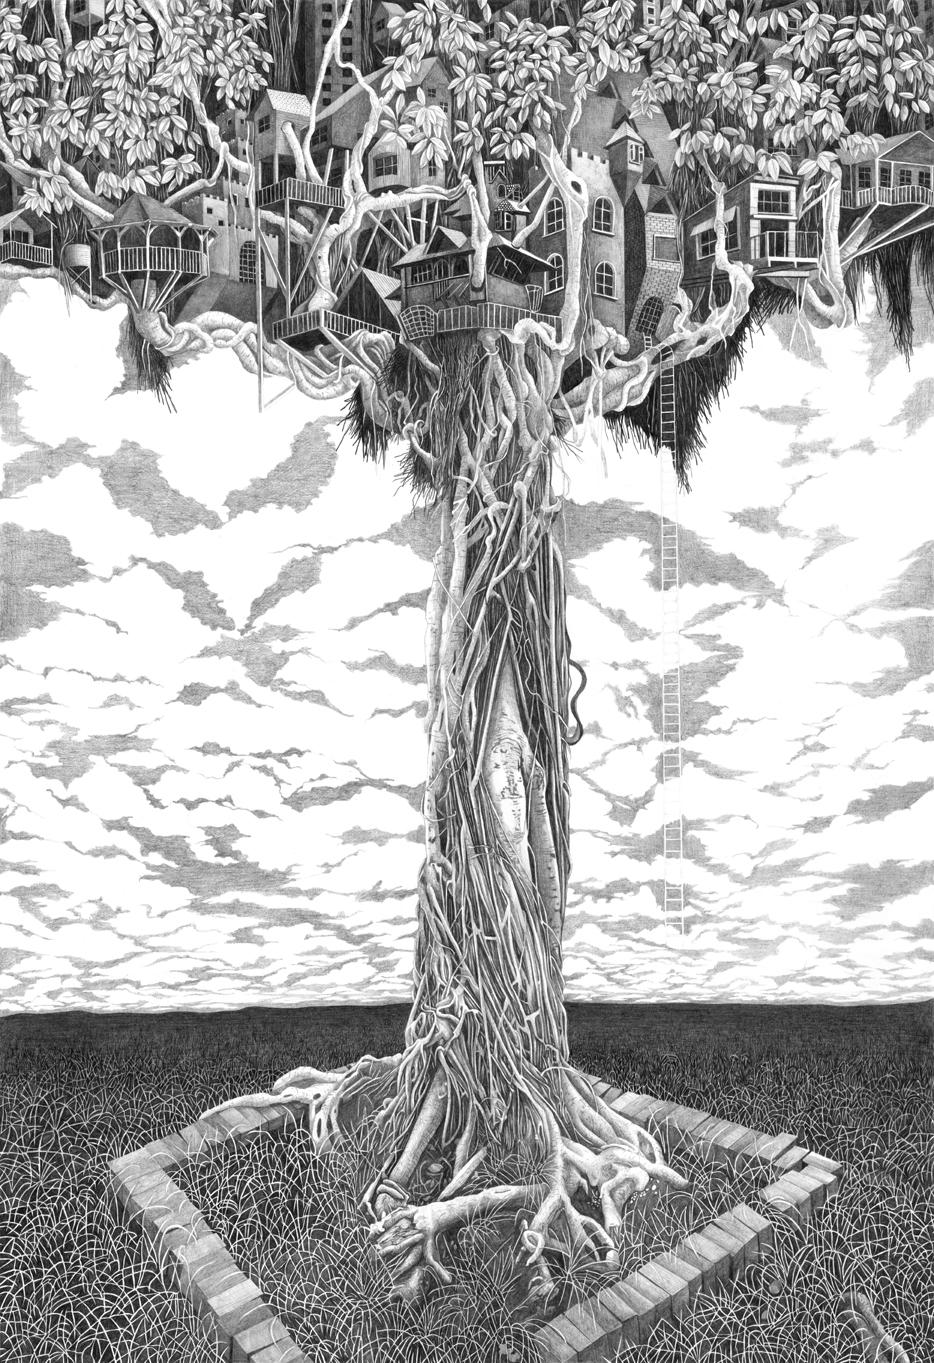 Tree House Ficus Microcarpa